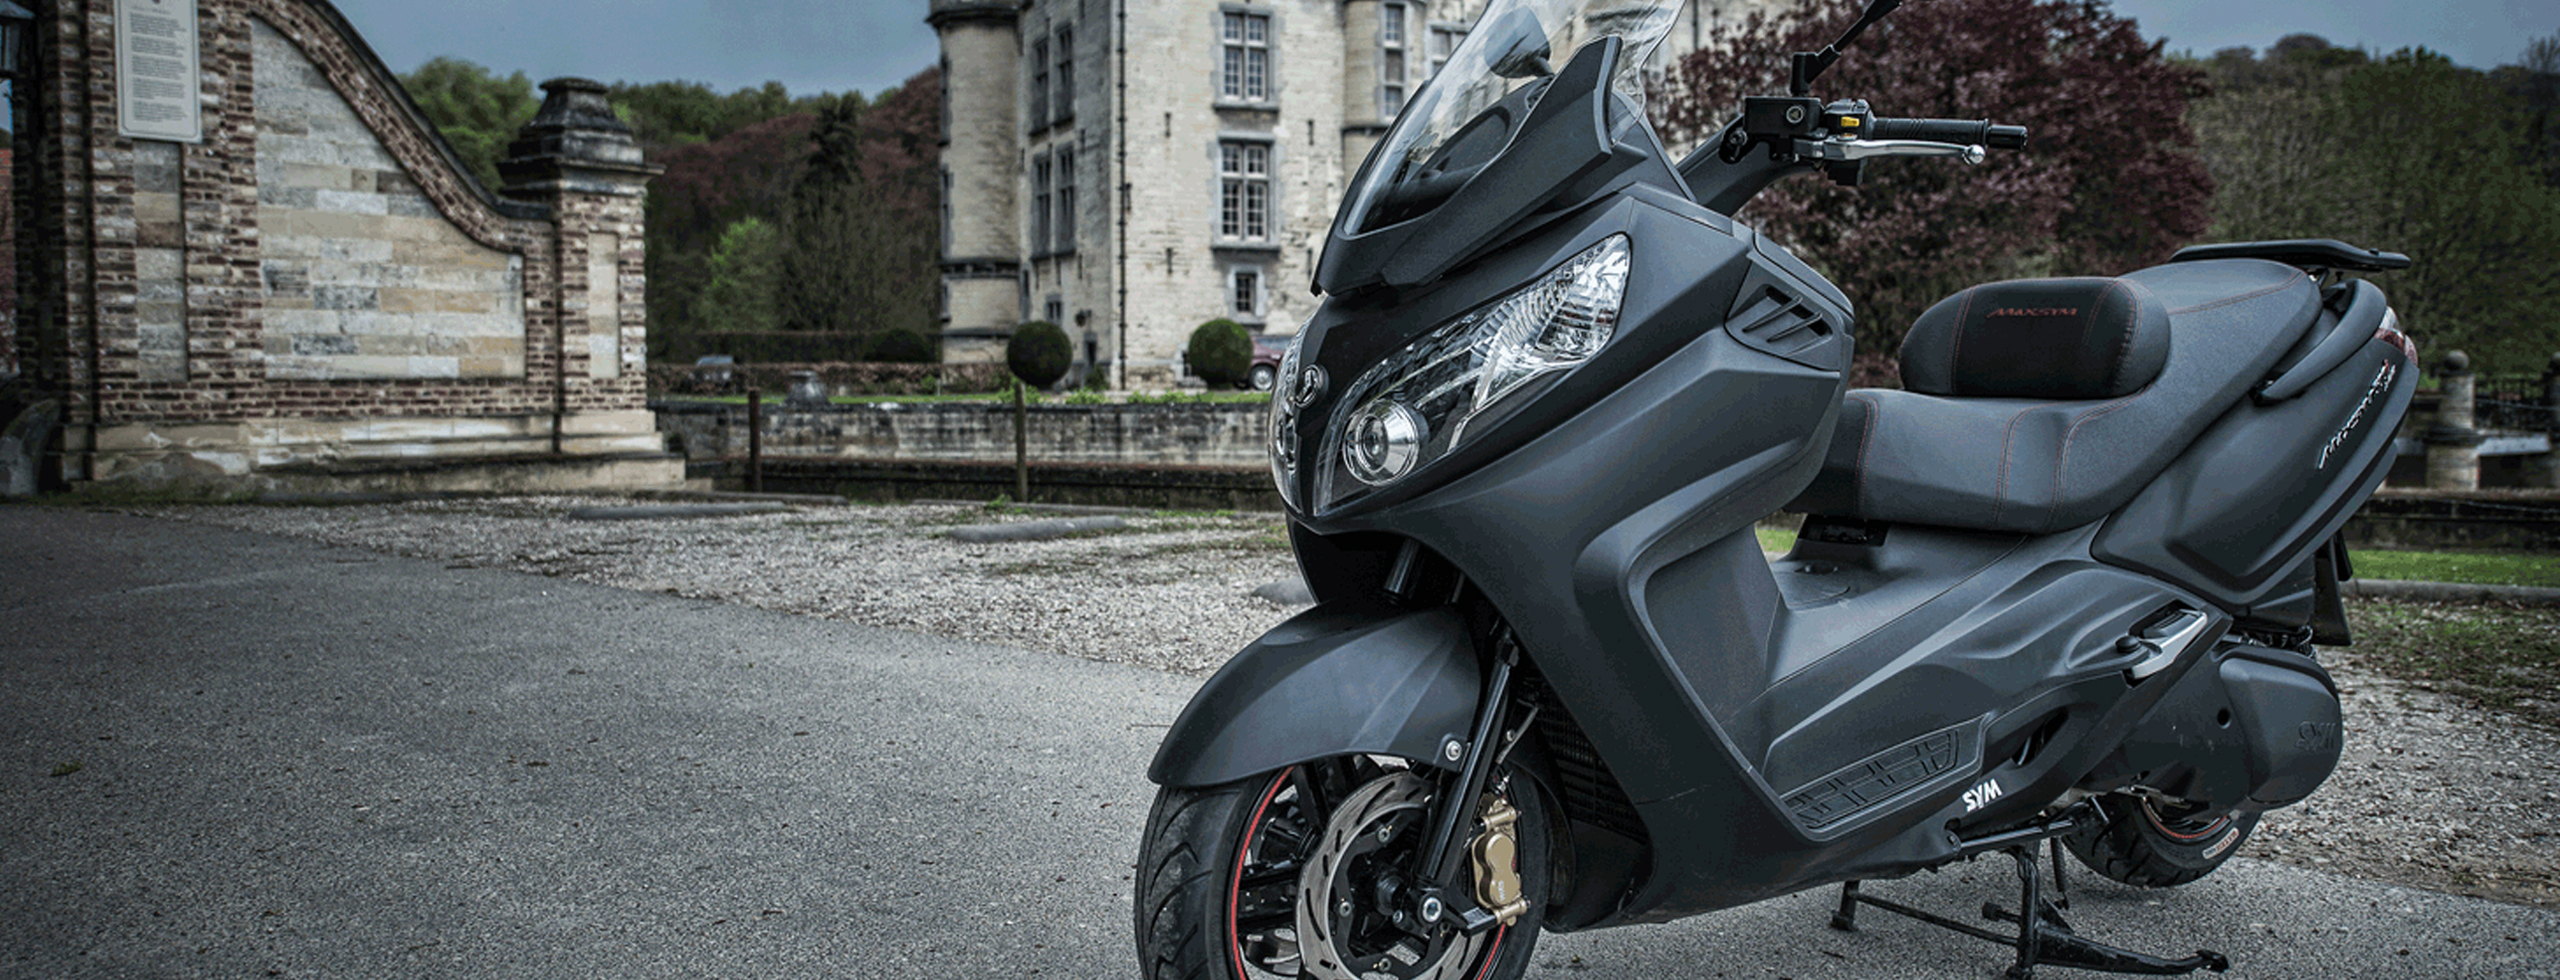 Hackmann2wielers - SYM scooter